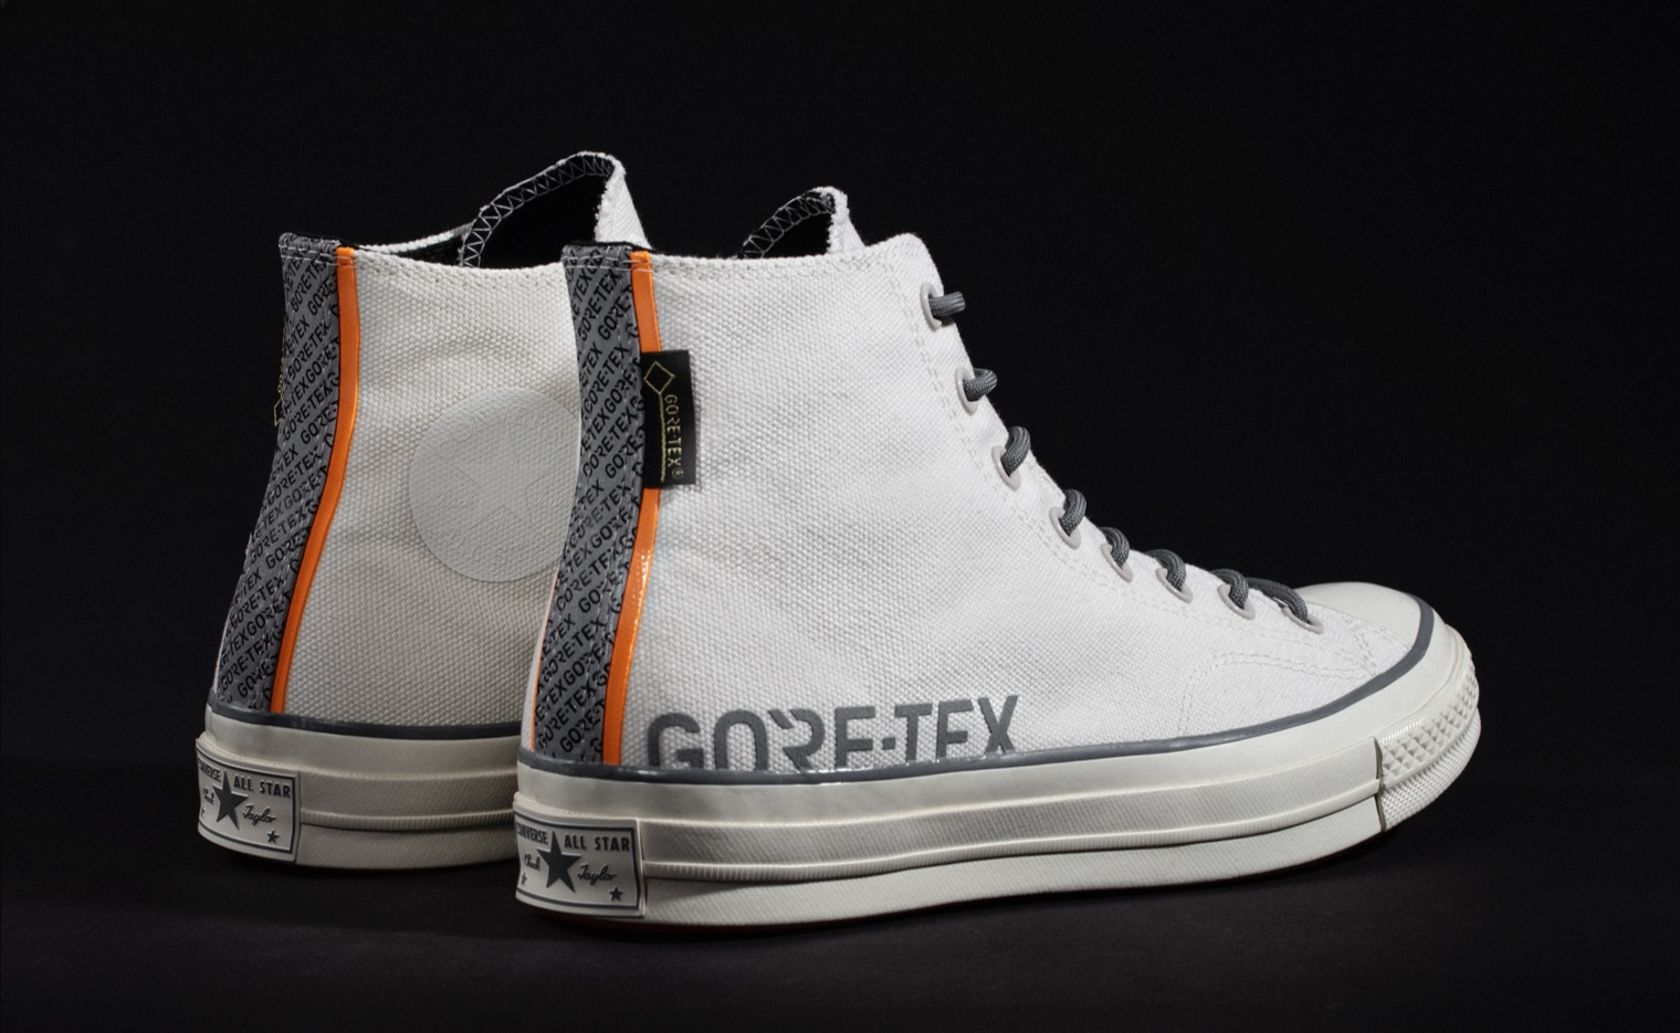 converse carhartt goretex Shop Clothing & Shoes Online